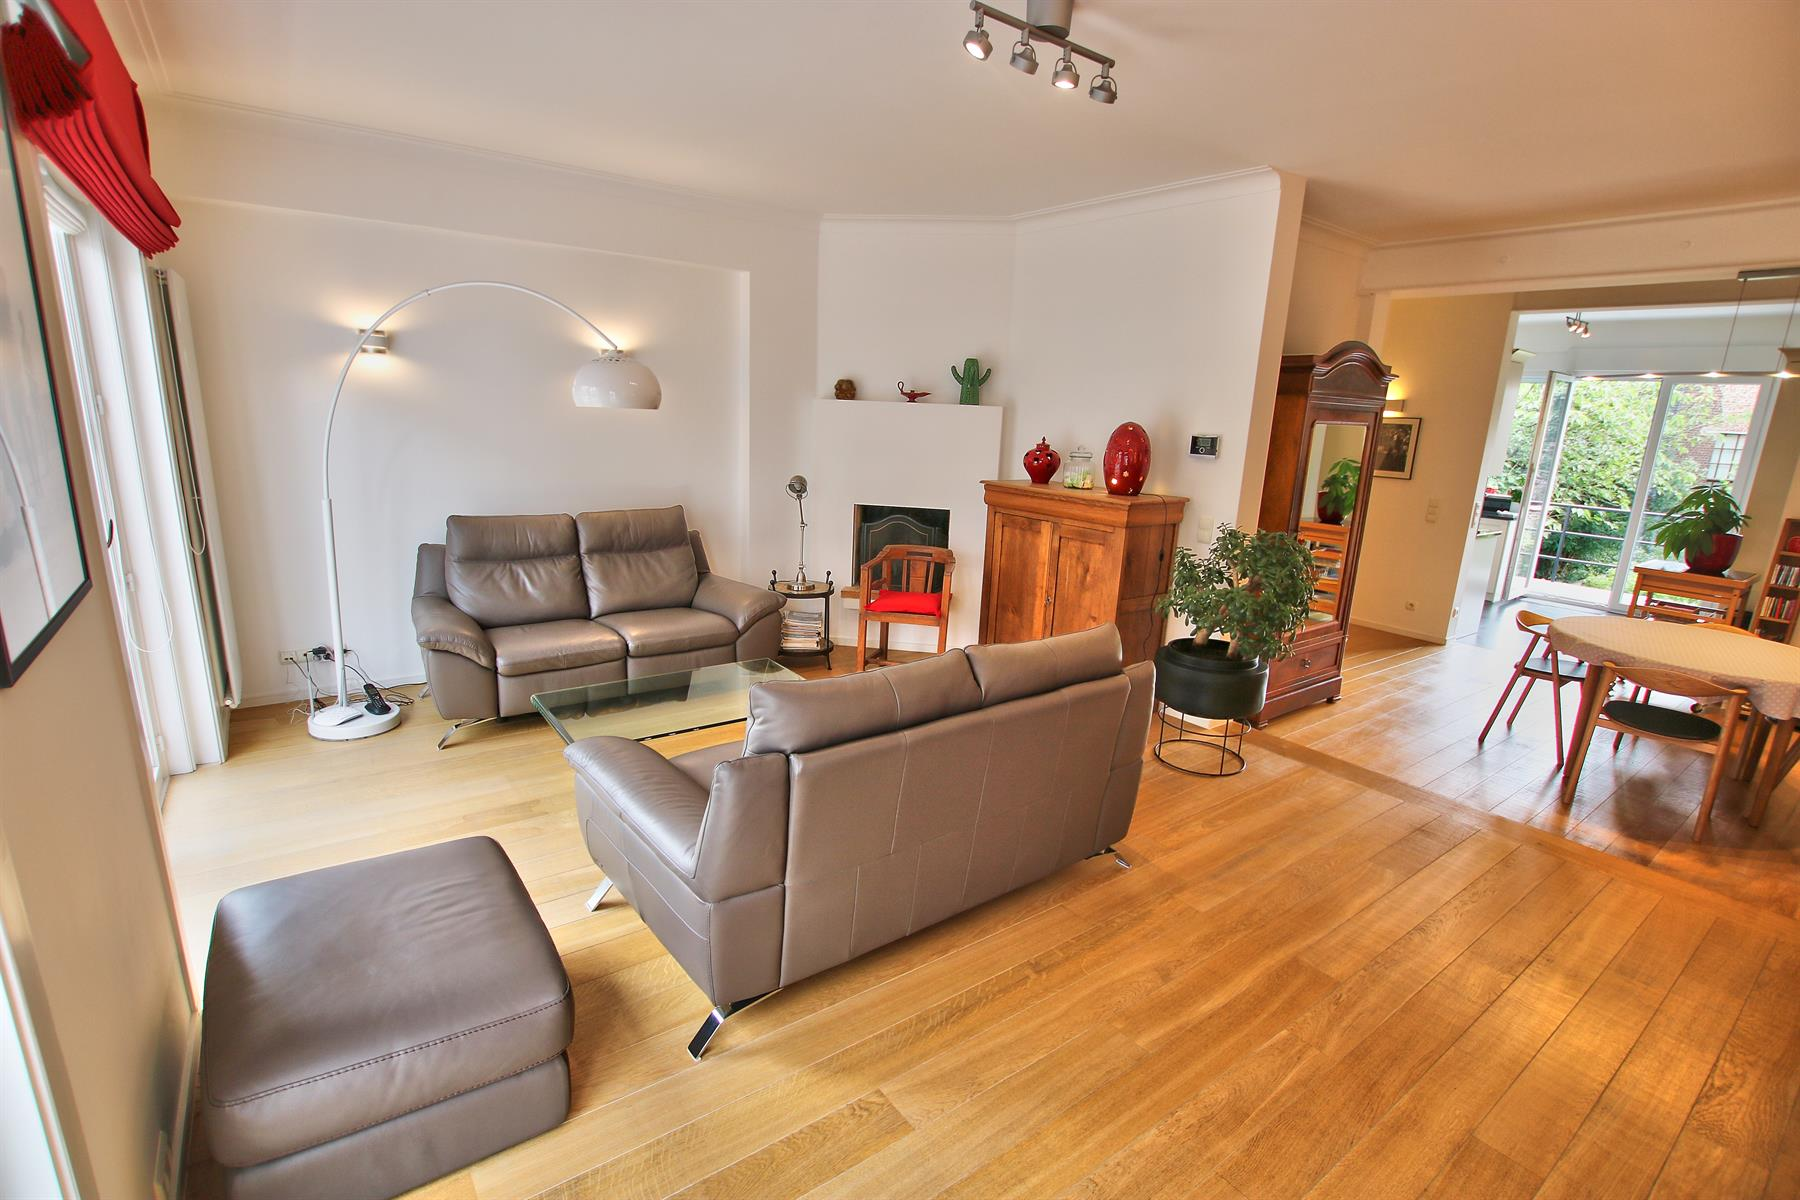 Maison - Etterbeek - #4454540-2